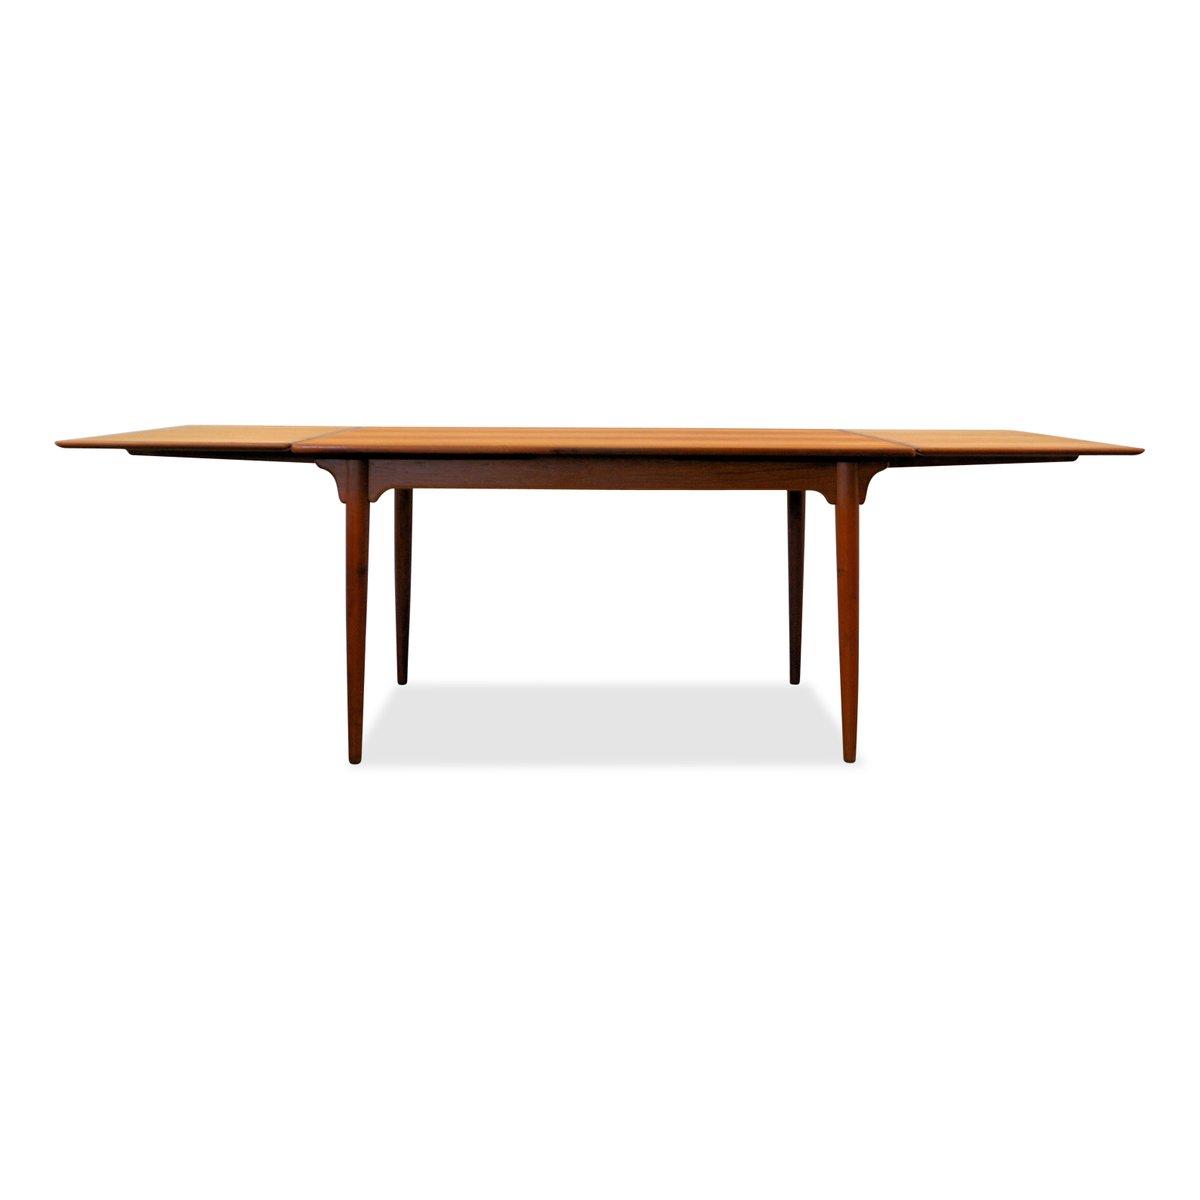 Danish Teak Extendable Dining Table from Omann Juns  : danish teak extendable dining table from omann juns mobelfabrik 1960s 9 from www.pamono.eu size 1200 x 1200 jpeg 22kB